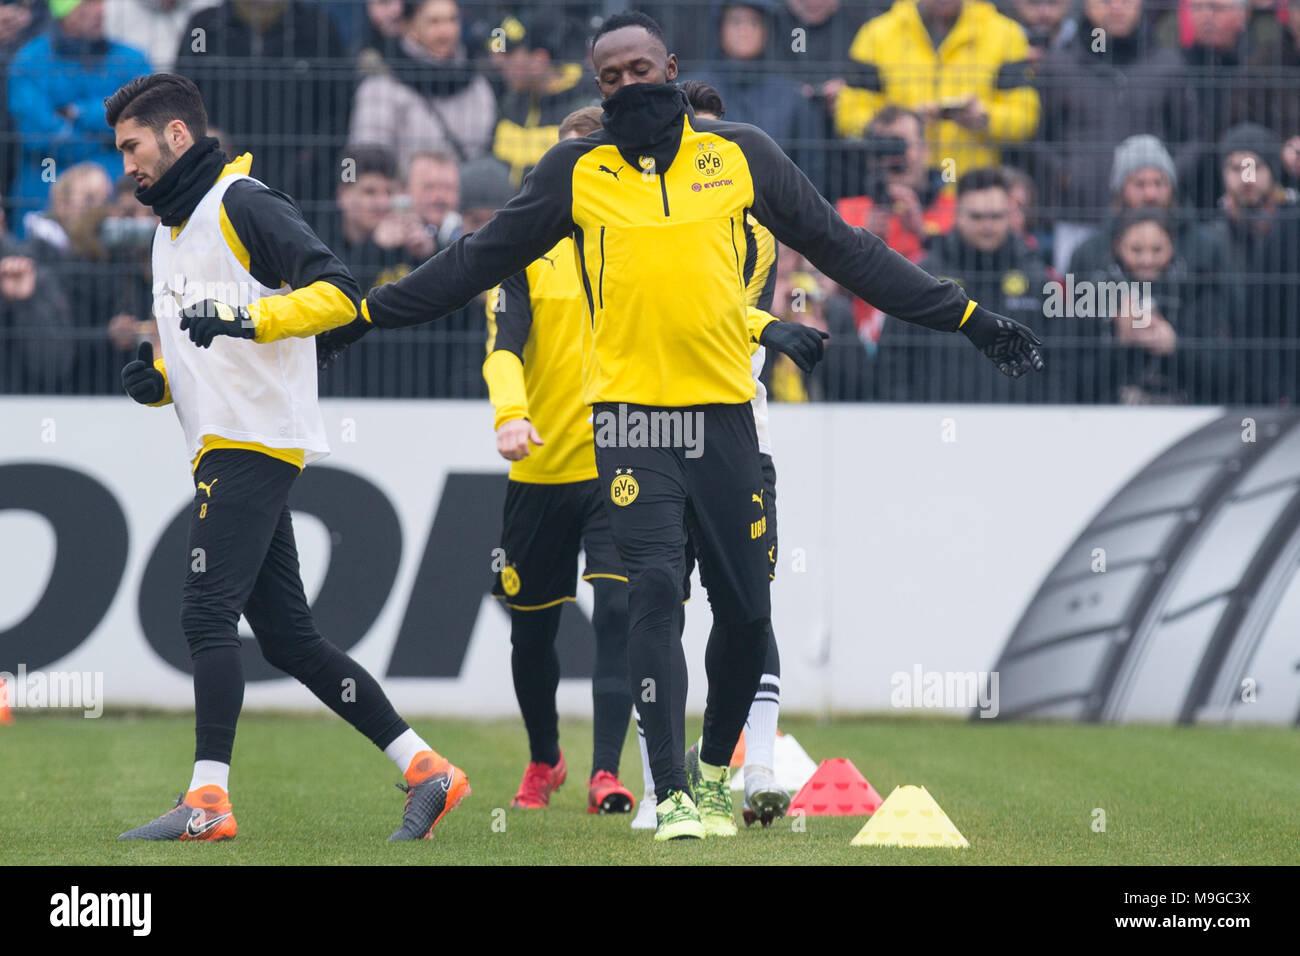 Usain BOLT (mi., ehem. Leichtathletik Profi) trainiert with den Profis des BVB, ganze Figur,  Fussball 1. Bundesliga, Training, Borussia Dortmund (DO) am 23.03.2018 in Dortmund/ Germany.  |usage worldwide - Stock Image